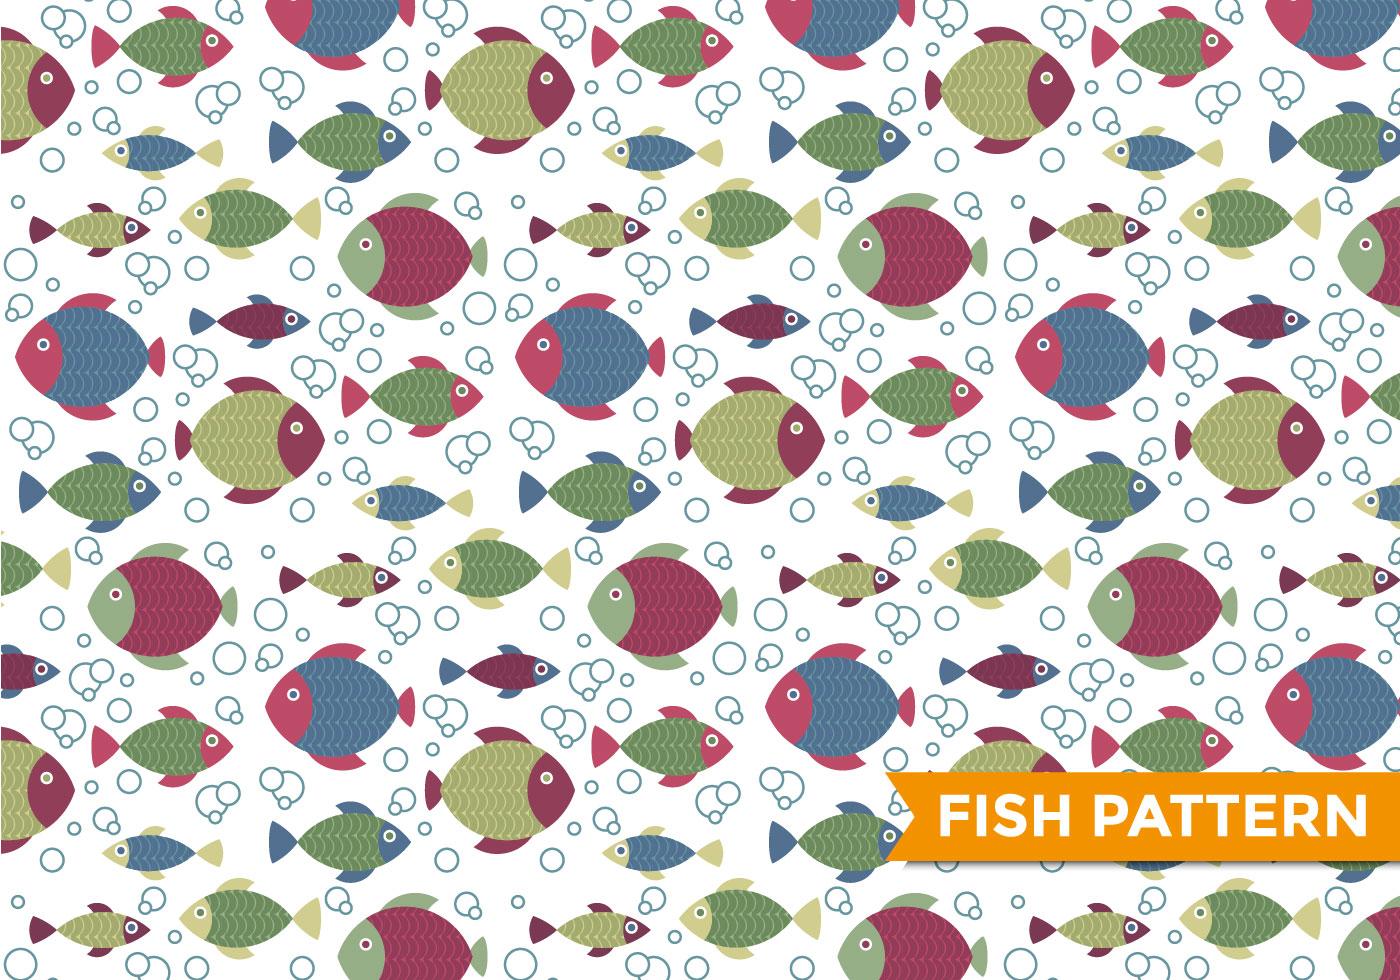 Fish Pattern Vector - Download Free Vector Art, Stock ...